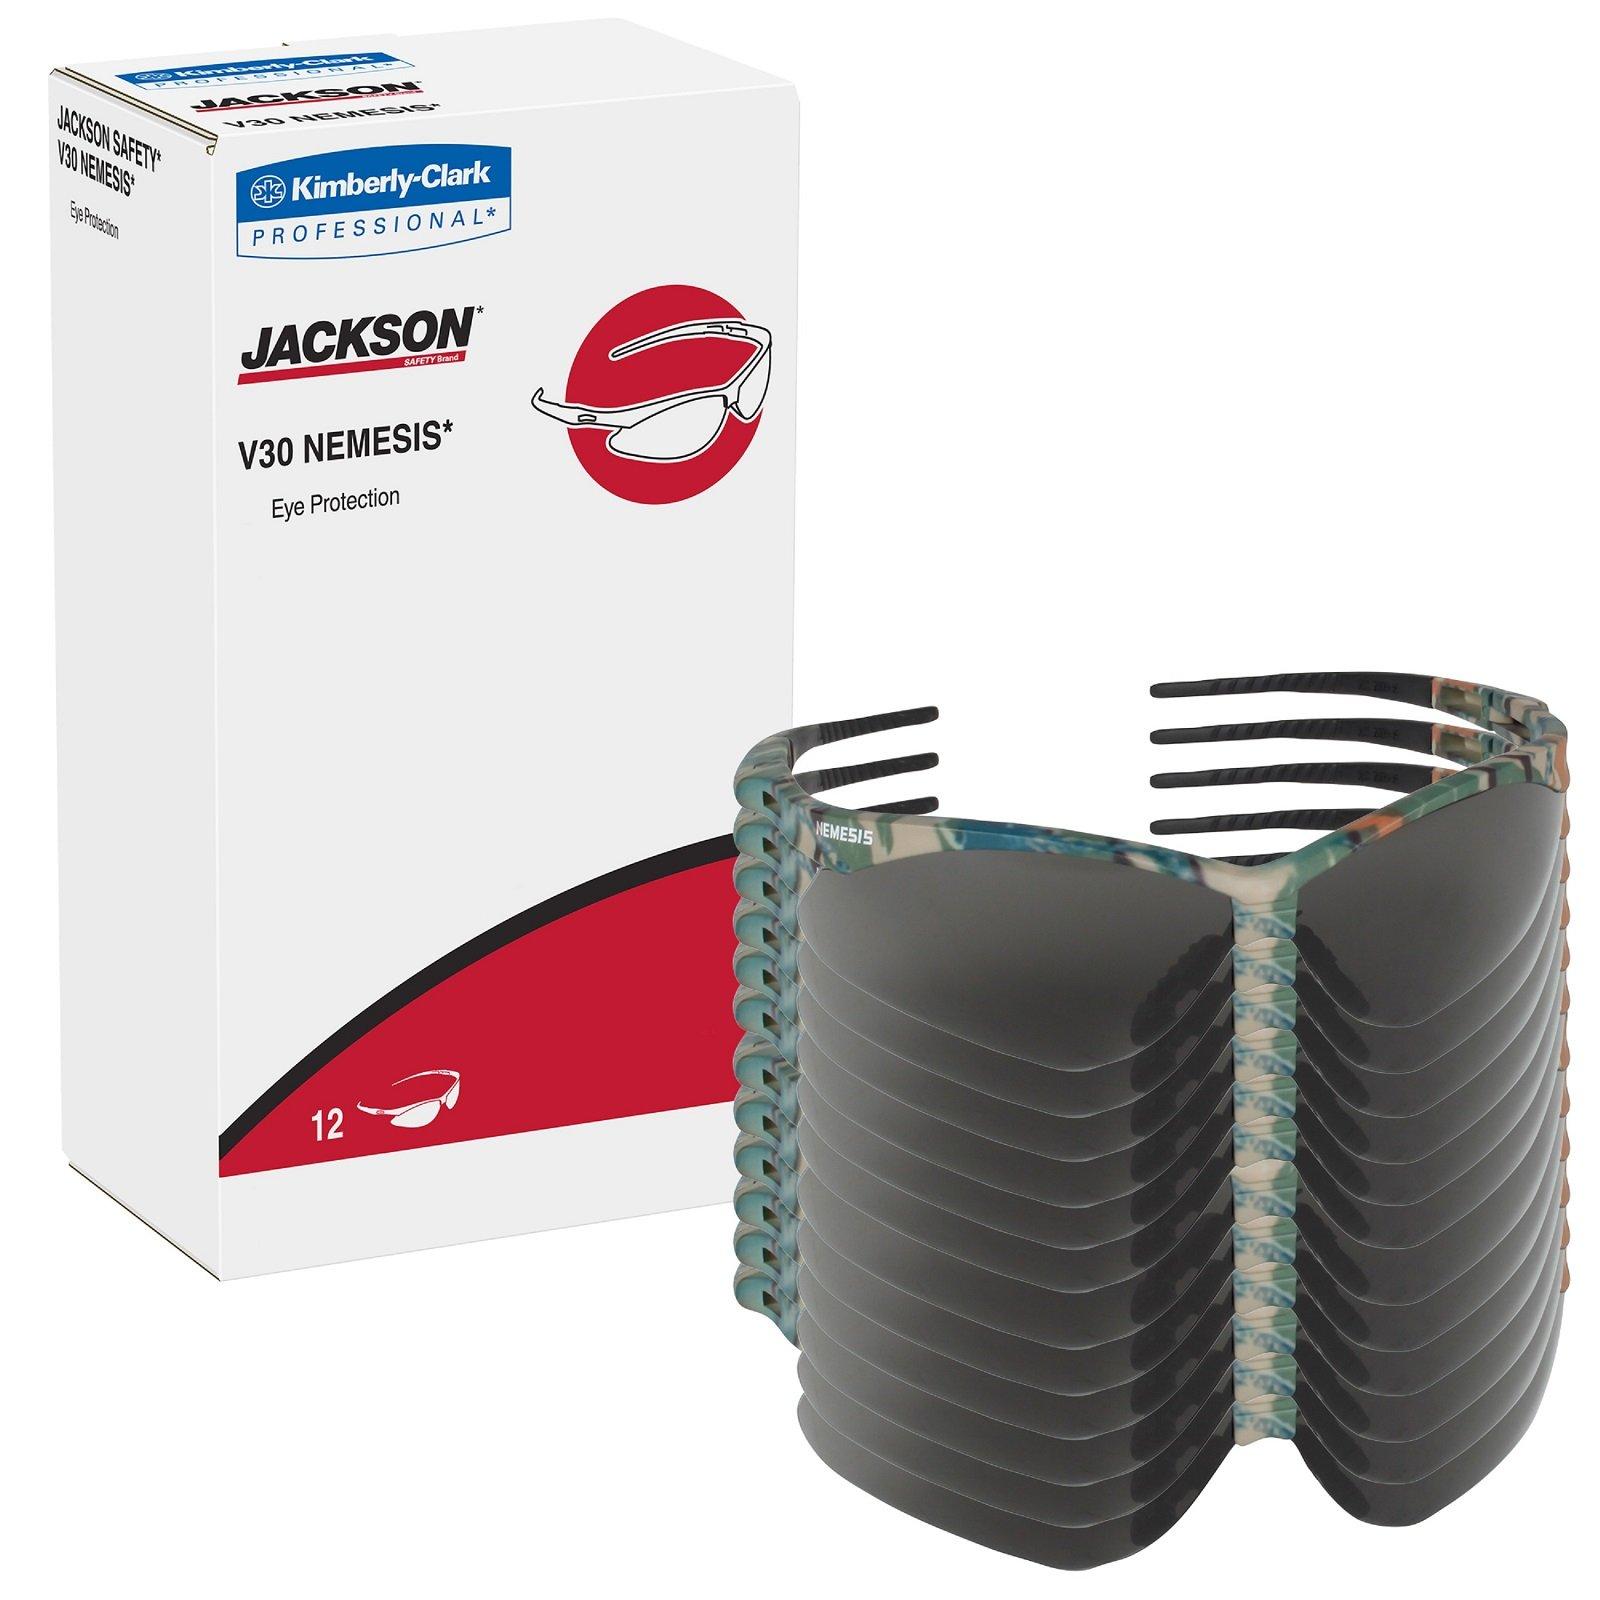 12 Pack Jackson Safety 3020707 V30 Nemesis Safety Glasses Camo Frame / Smoke Anti-Fog Lens(22609) by Allsafe Services & Materials